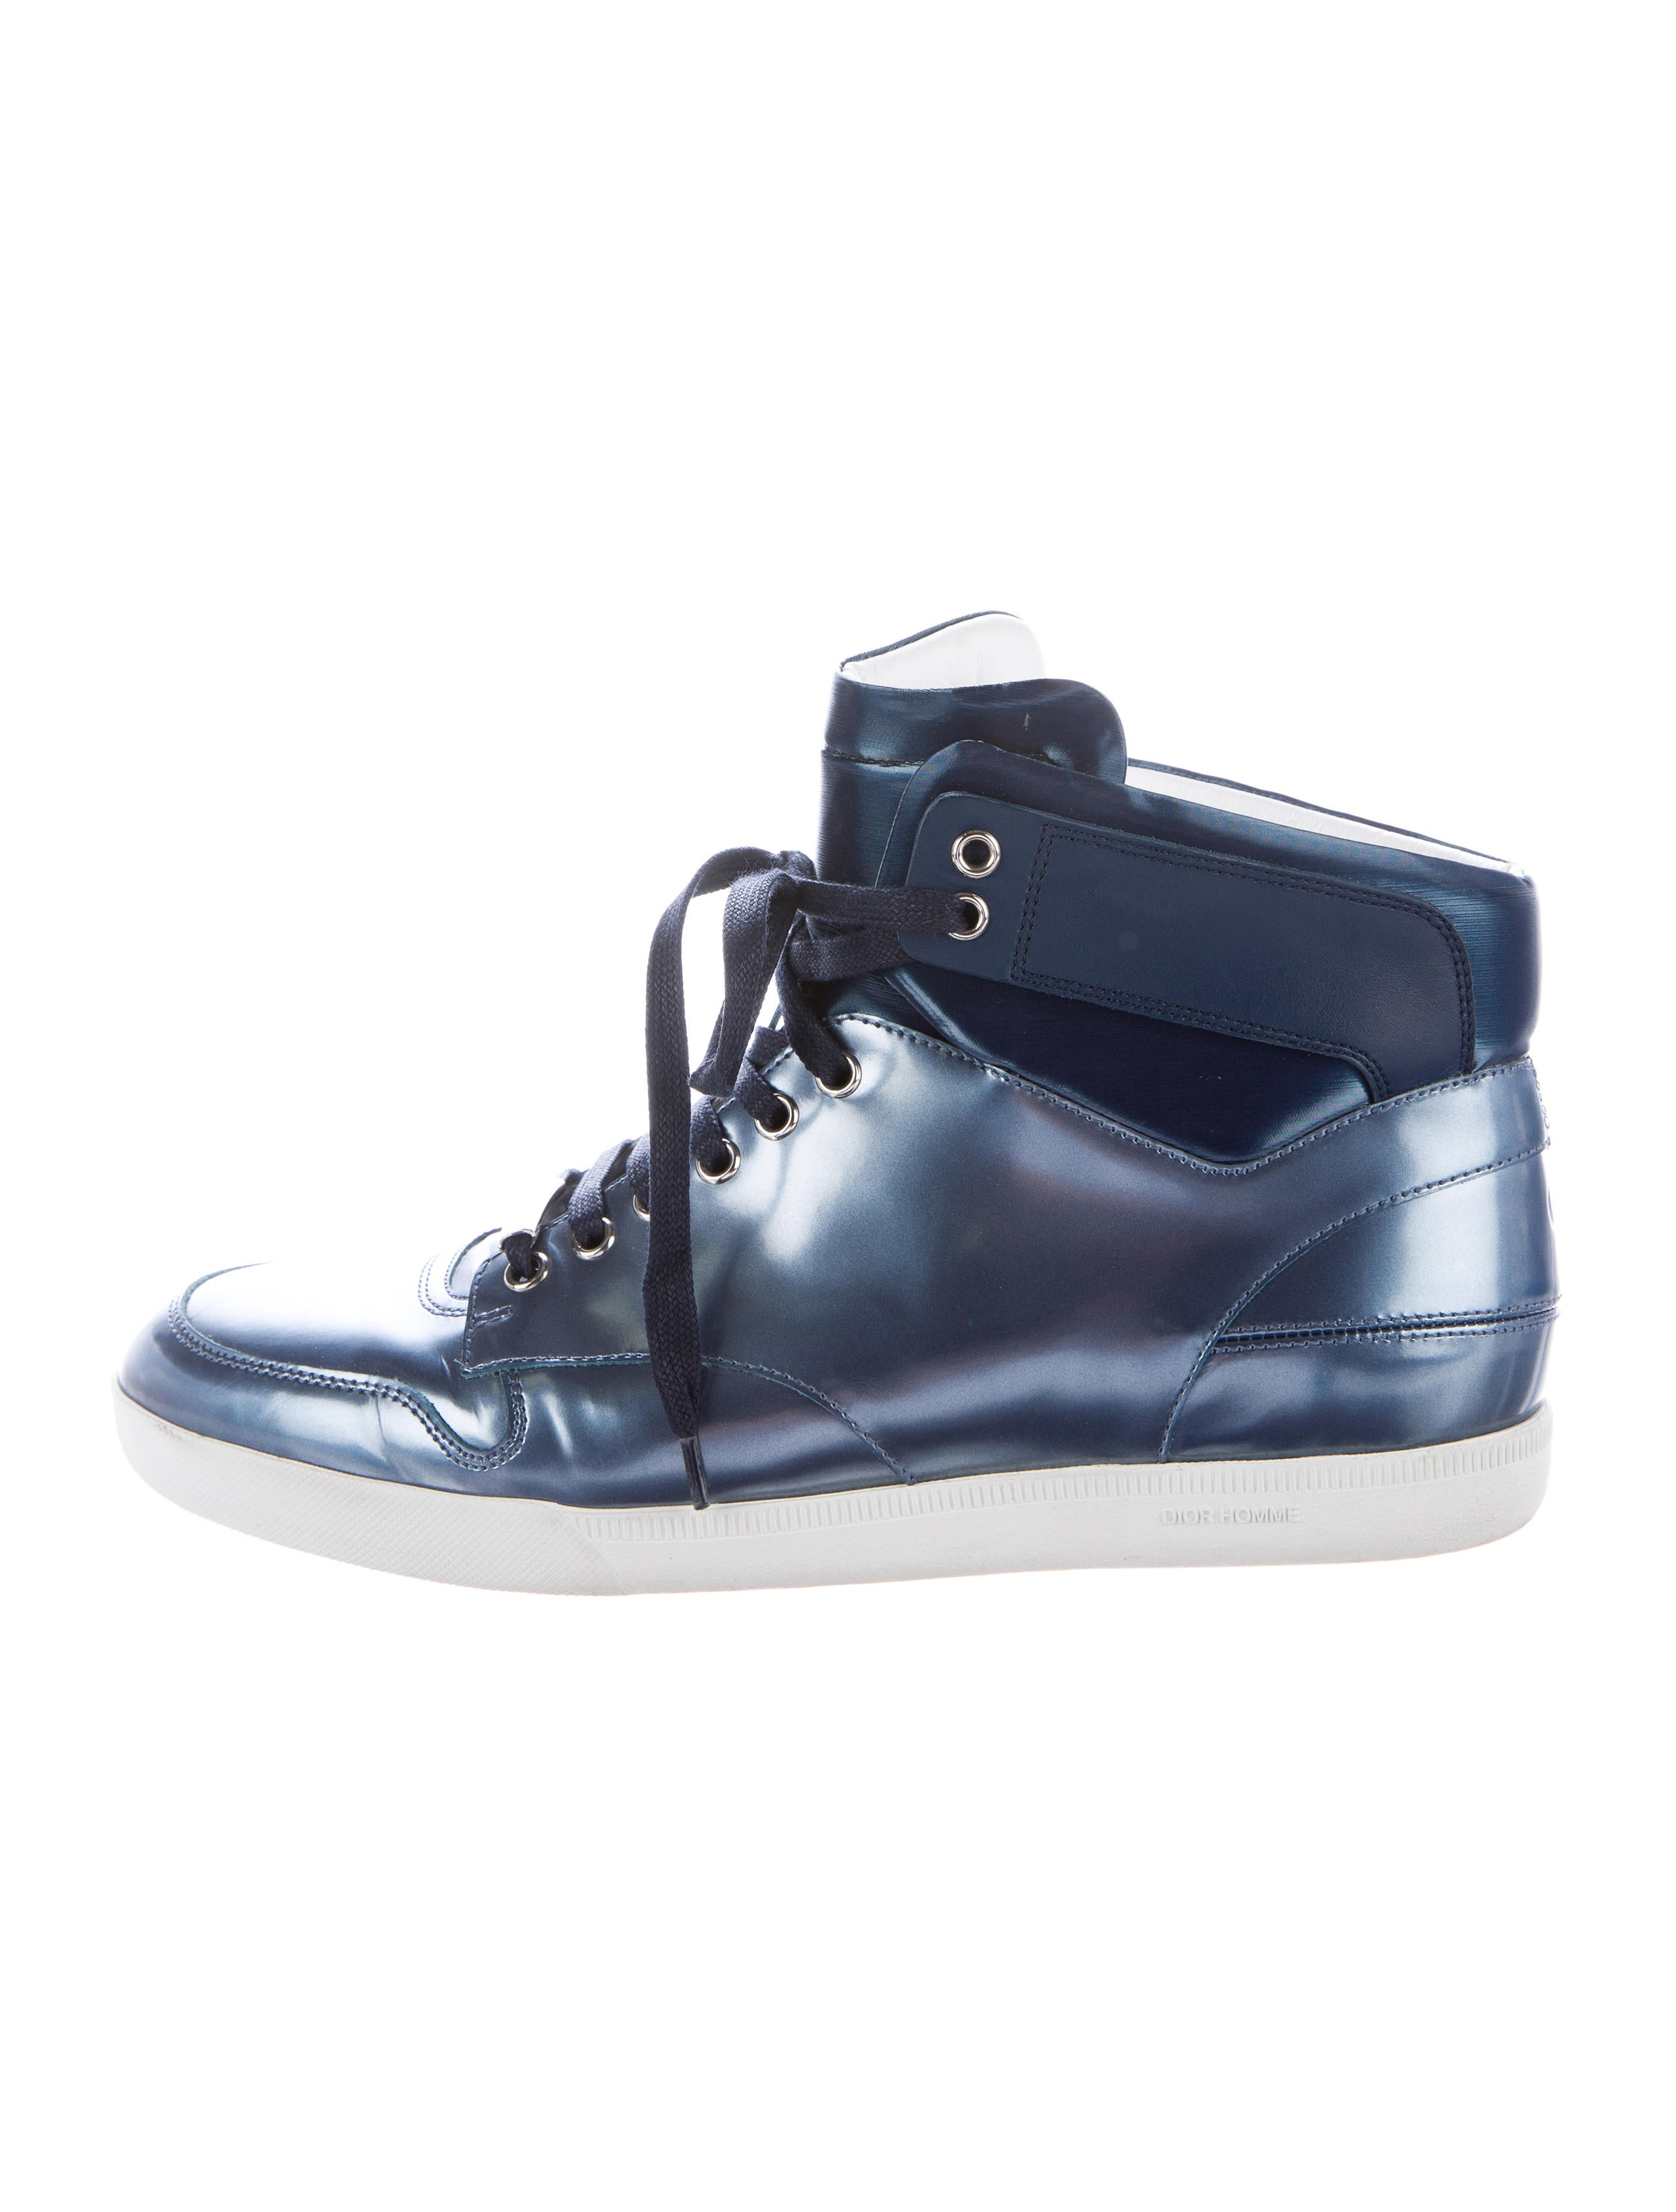 Dior Homme Metallic High-Top Sneakers - 343.1KB